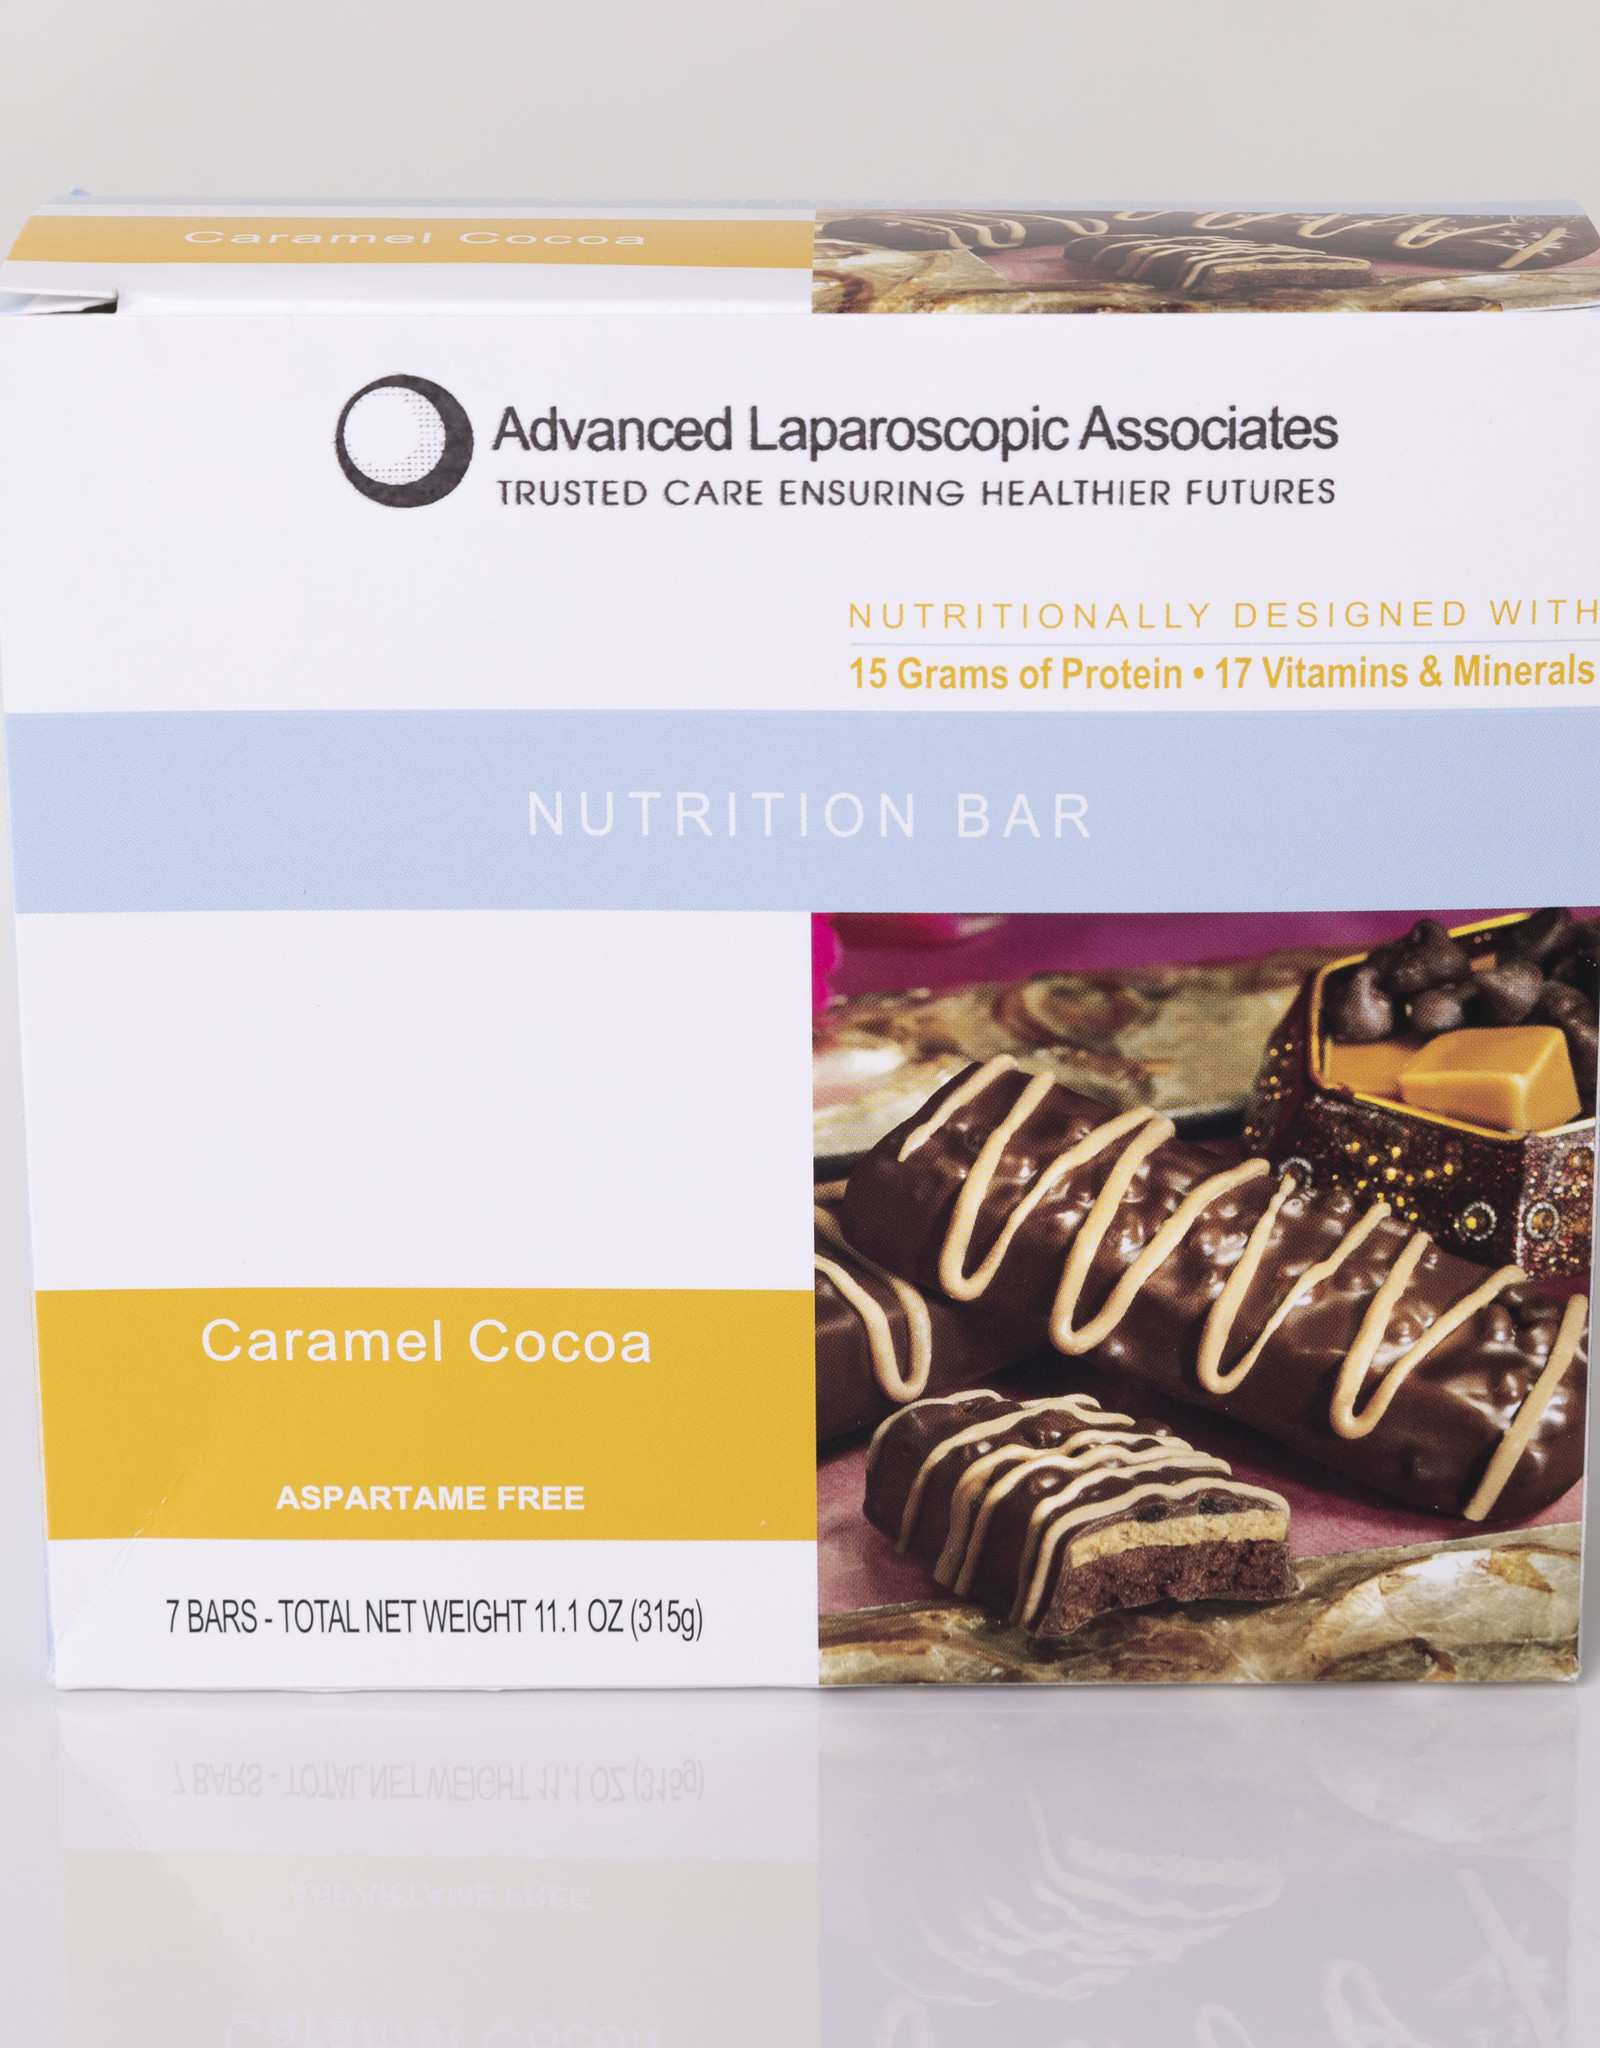 Advanced Laparoscopic Associates Caramel Cocoa Bar